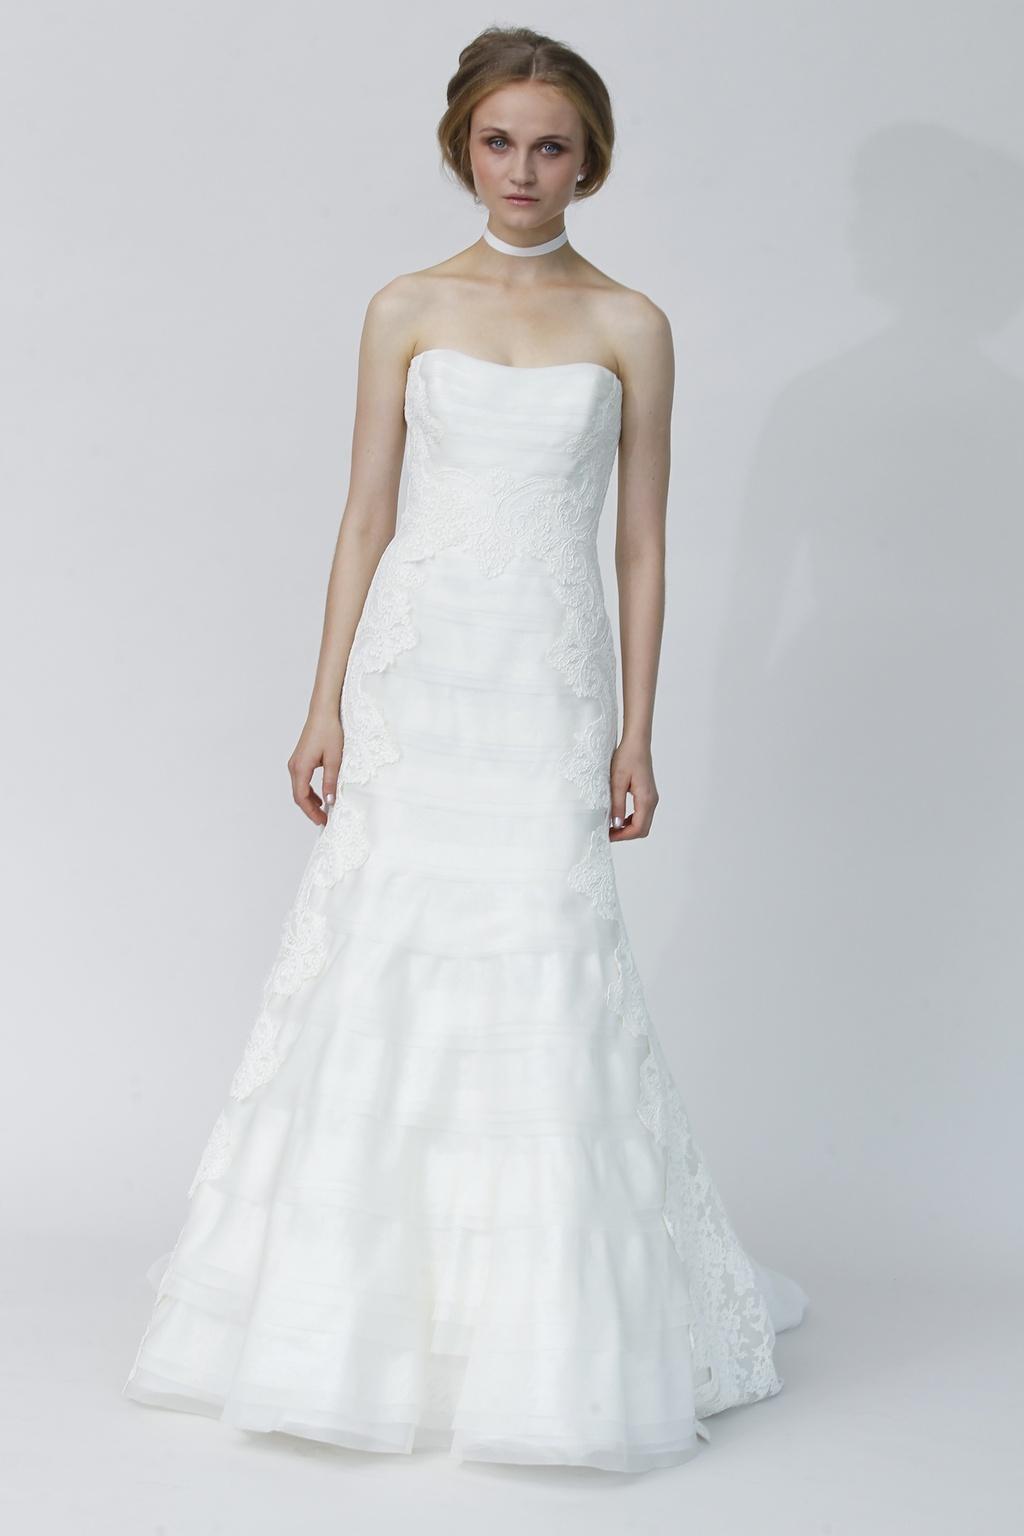 Cila-wedding-dress-by-rivini-fall-2014-bridal.full